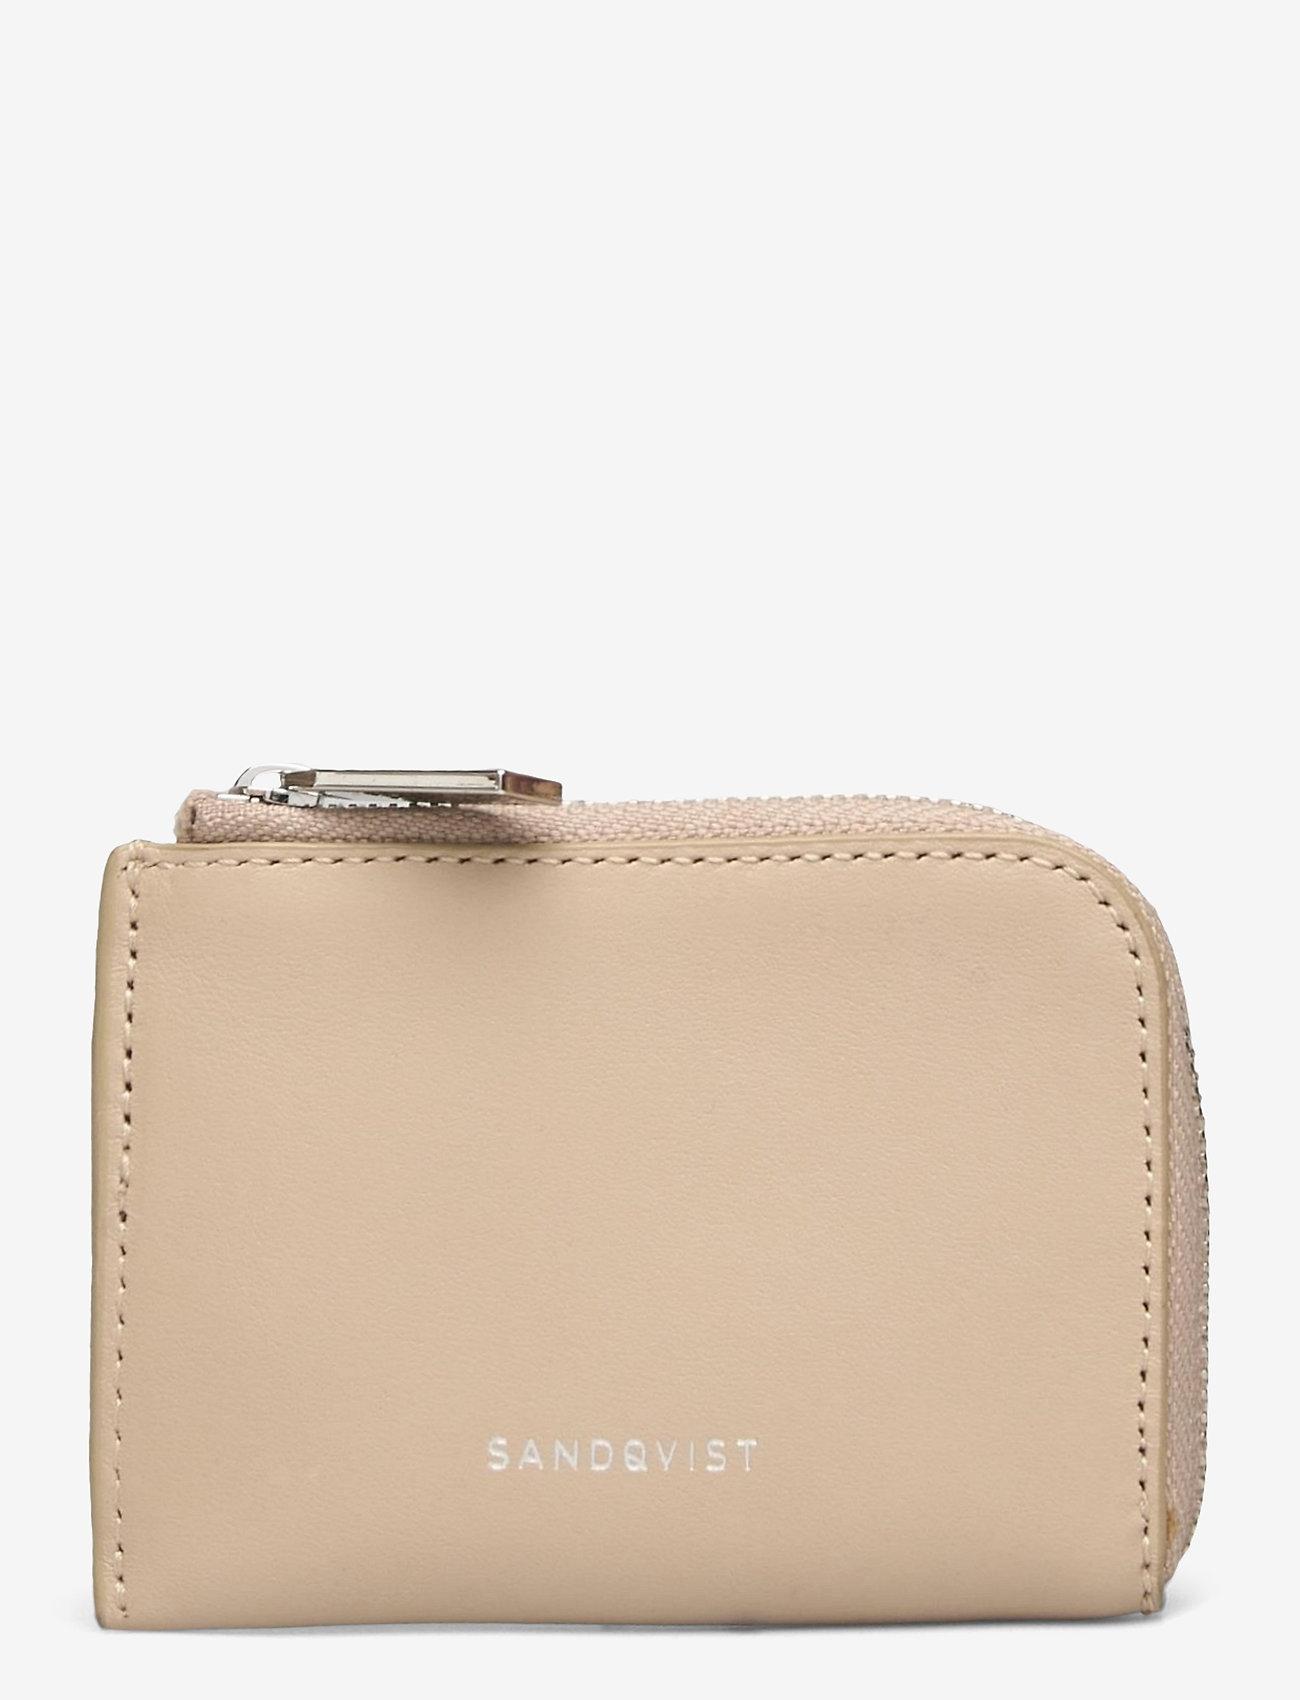 SANDQVIST - EBEN - etui na karty kredytowe - beige - 0